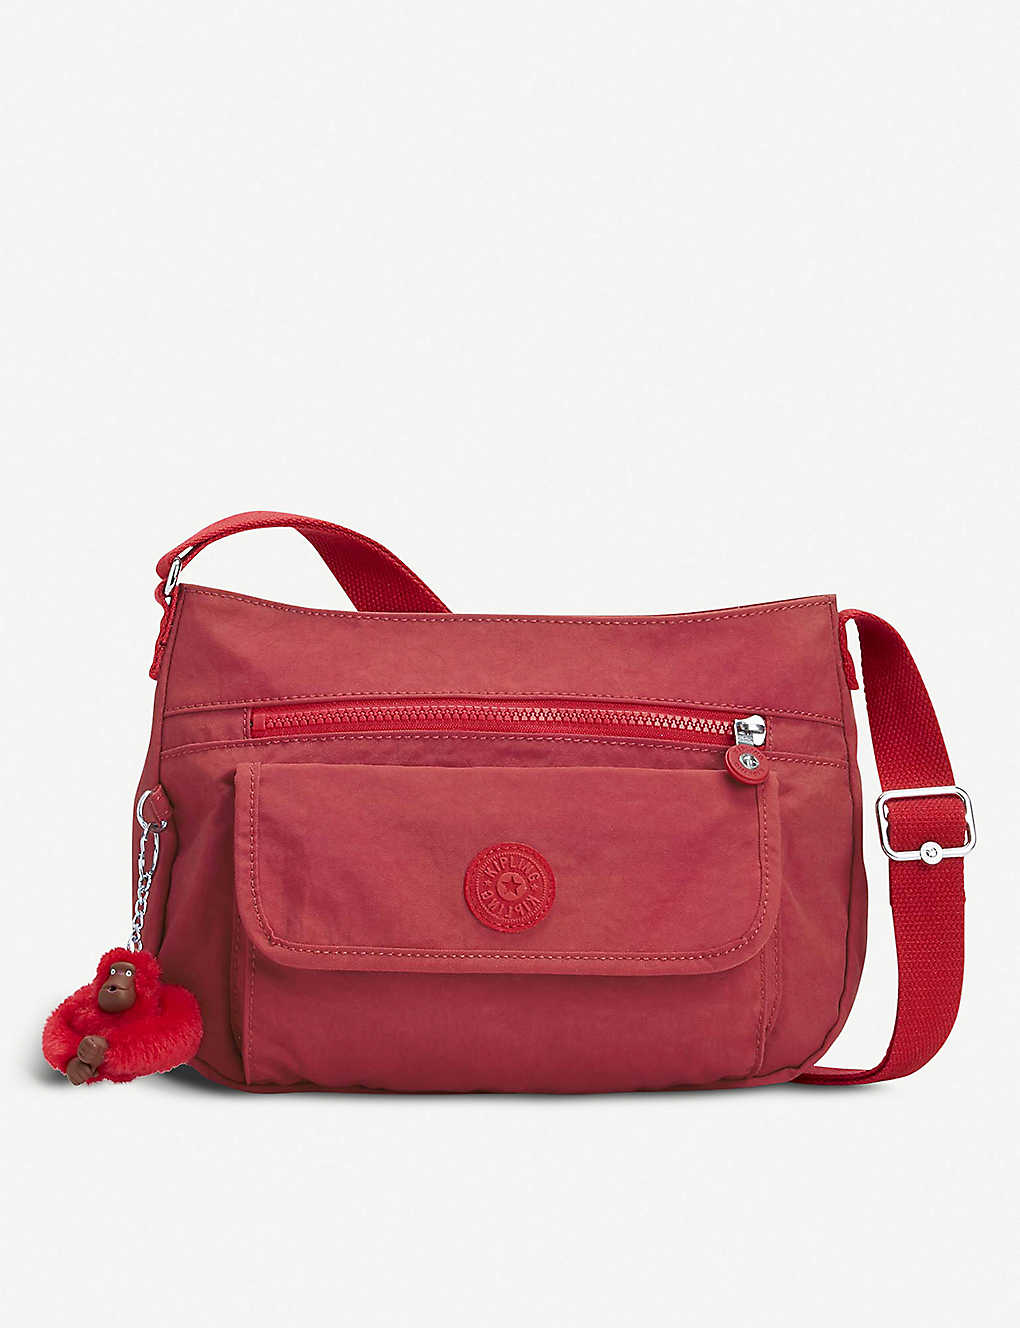 af97cca7a083 KIPLING - Syro nylon crossbody bag